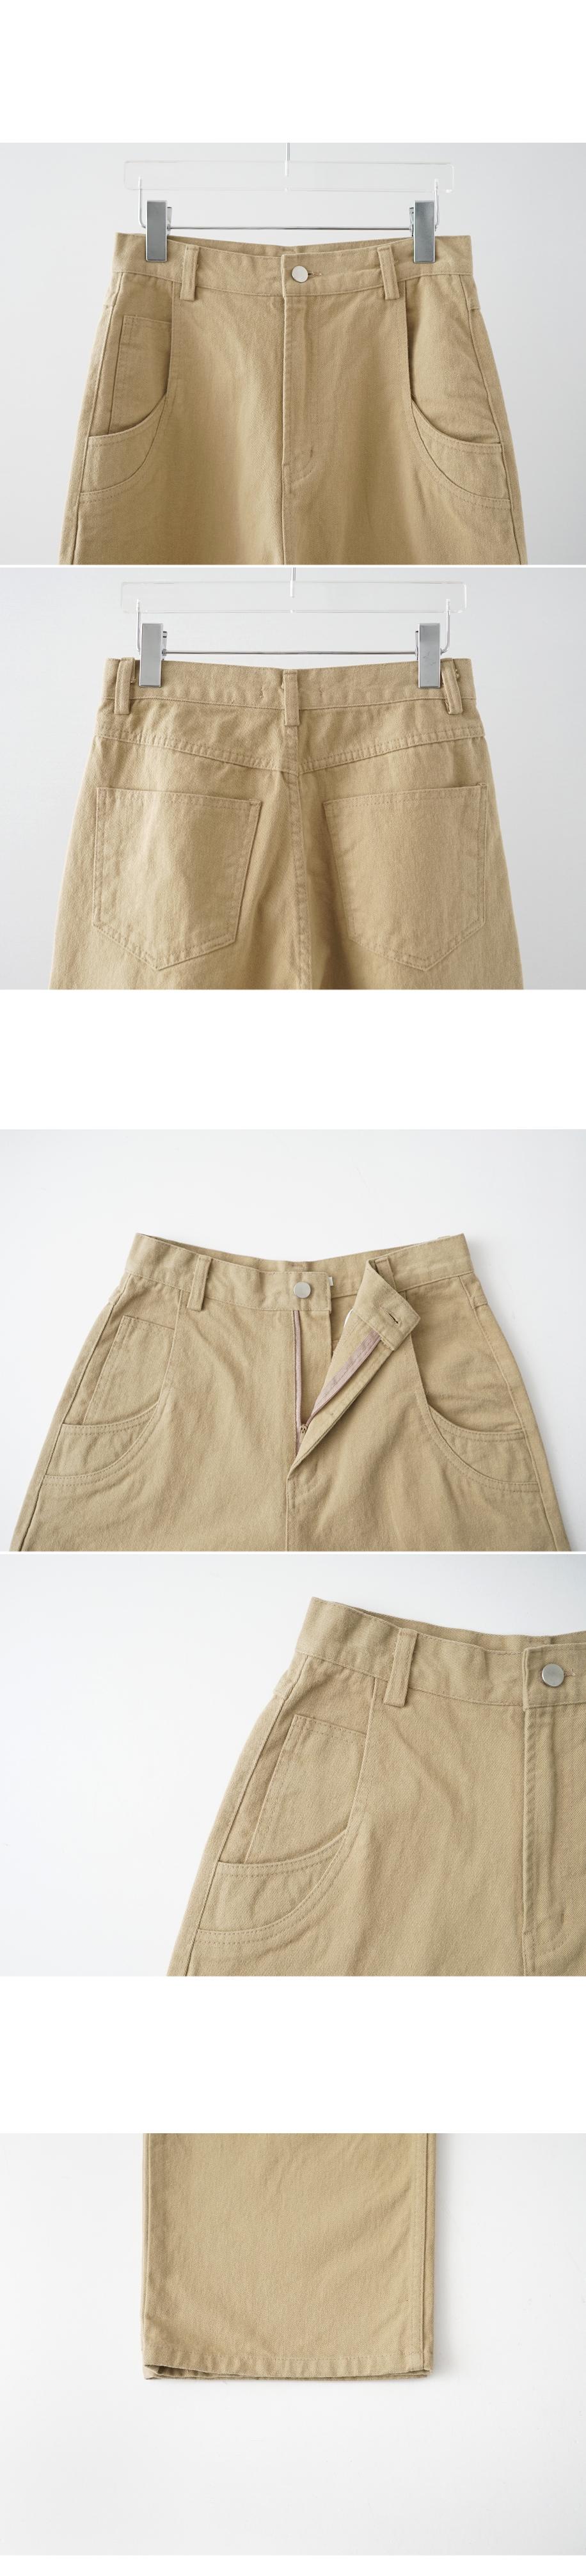 maxi napping cotton pants